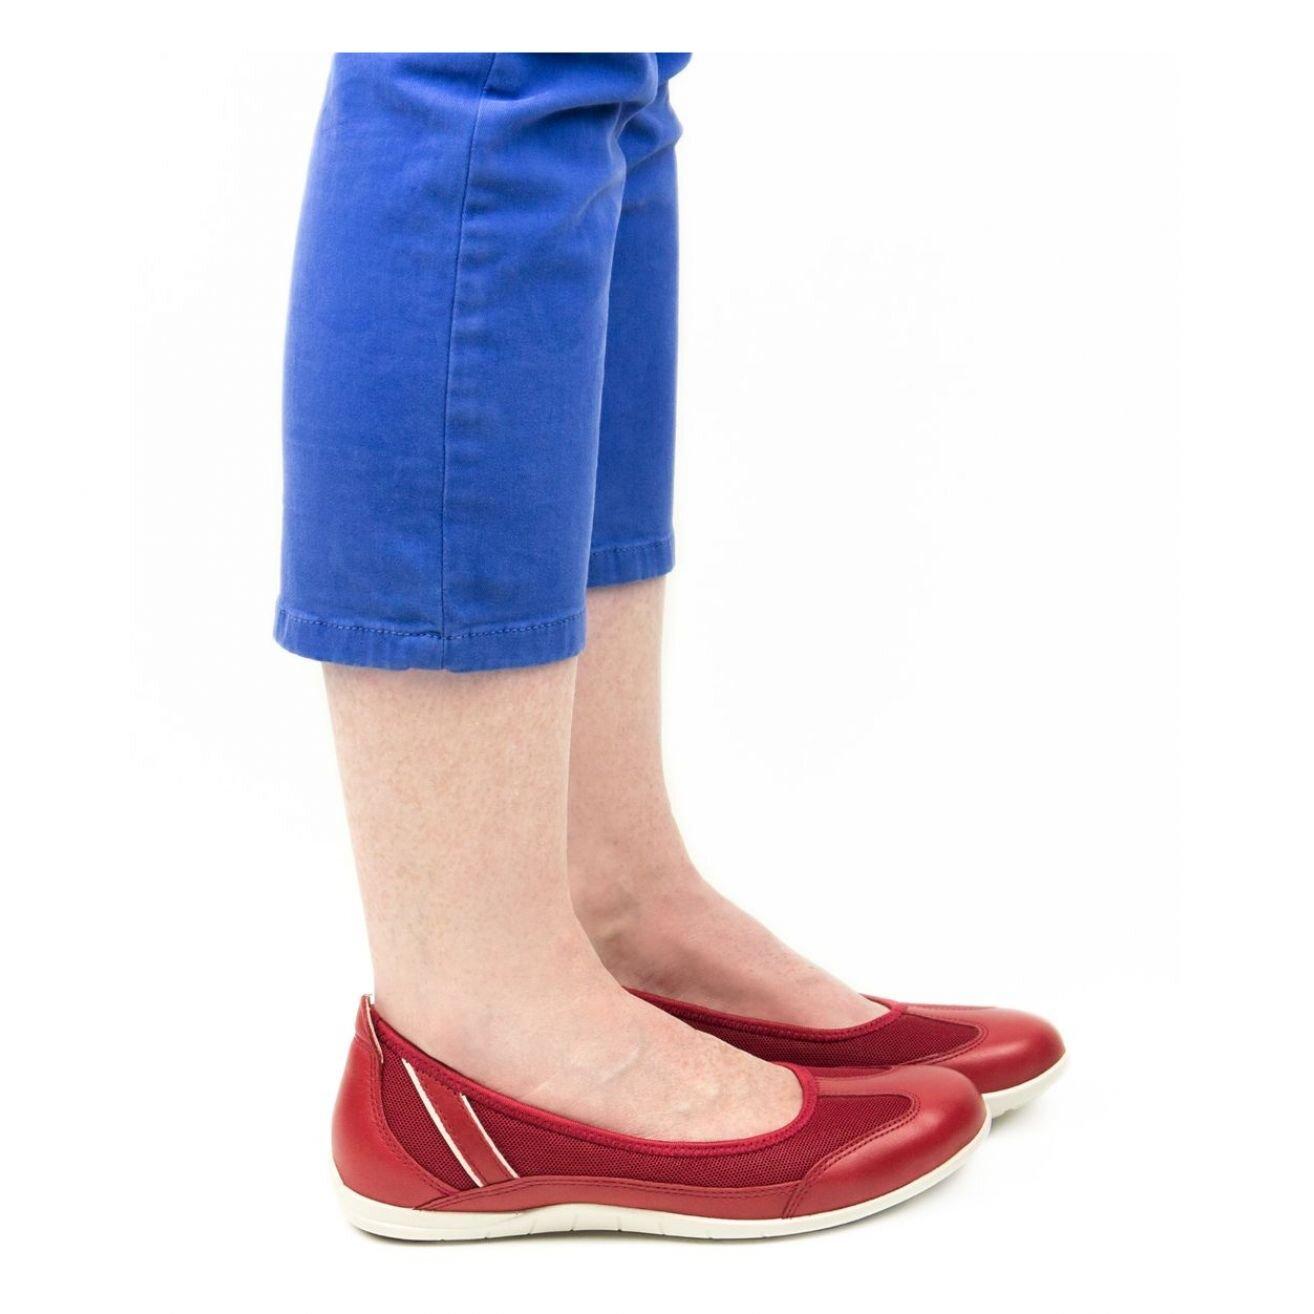 All Ecco Bluma women's shoes